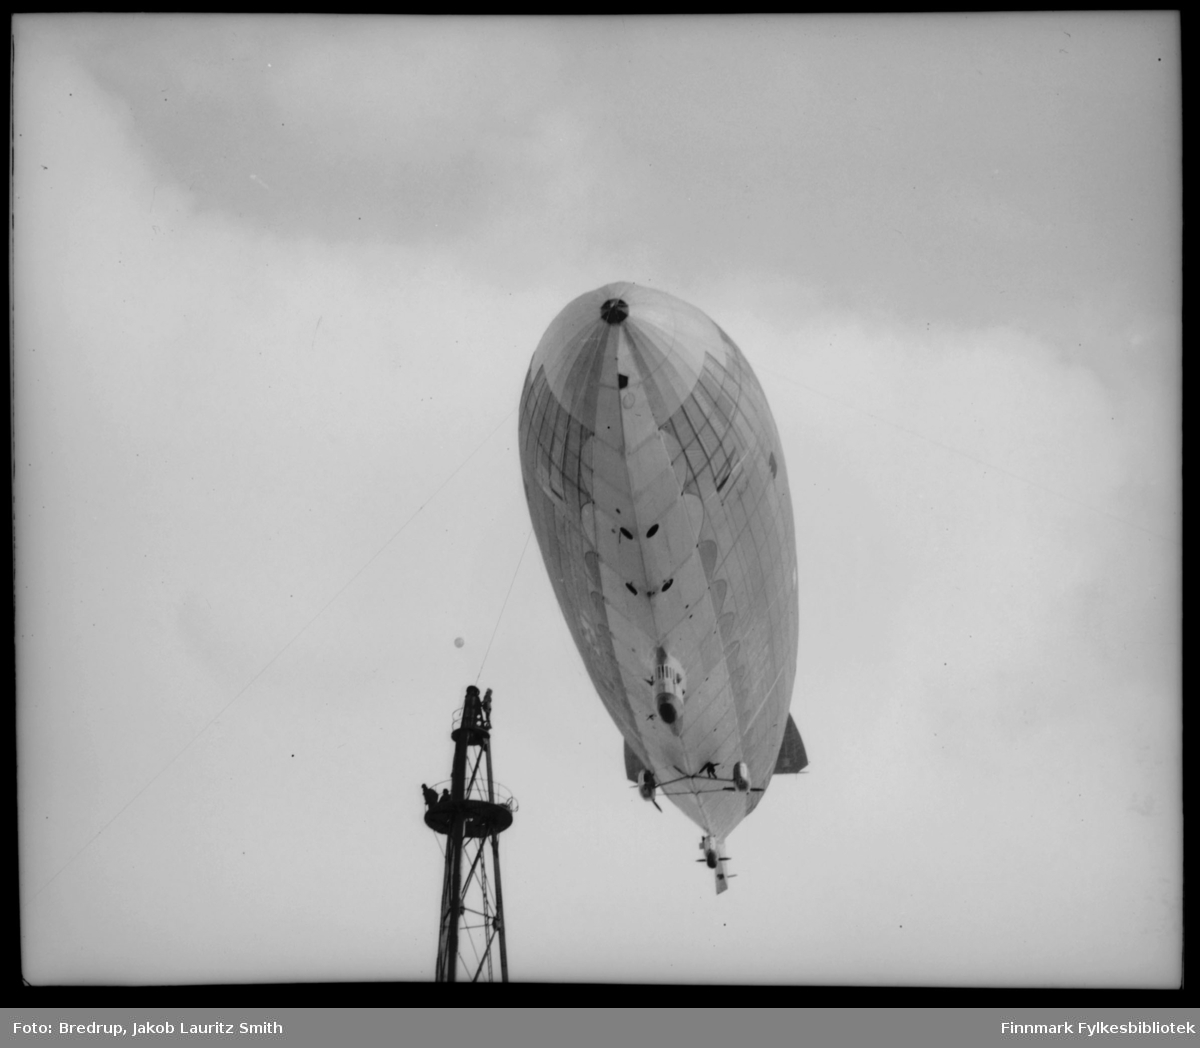 Luftskipet Norge forankret i luftskipsmasta på Vadsøya, mai 1926.  Fotografen har stått nesten rett under luftskipet, så bildet er tatt fra en interessant vinkel.  Man kan ikke lese hele navnet, men luftskipet er merket N1, og kan identifiseres som Norge.